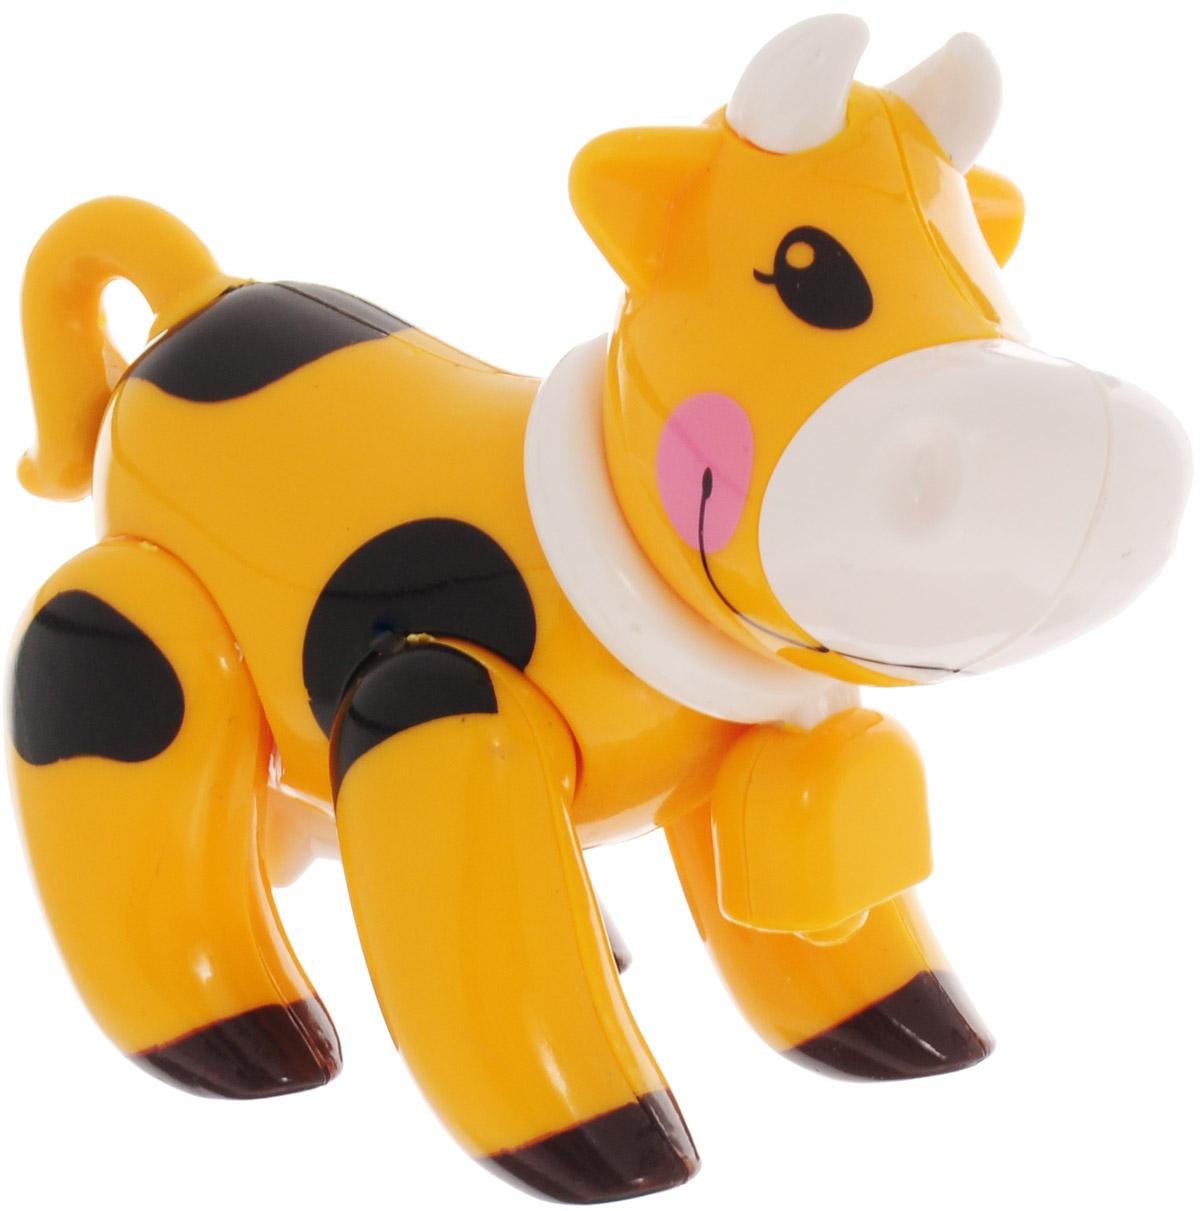 Ути-Пути Развивающая игрушка Корова цвет желтый цена